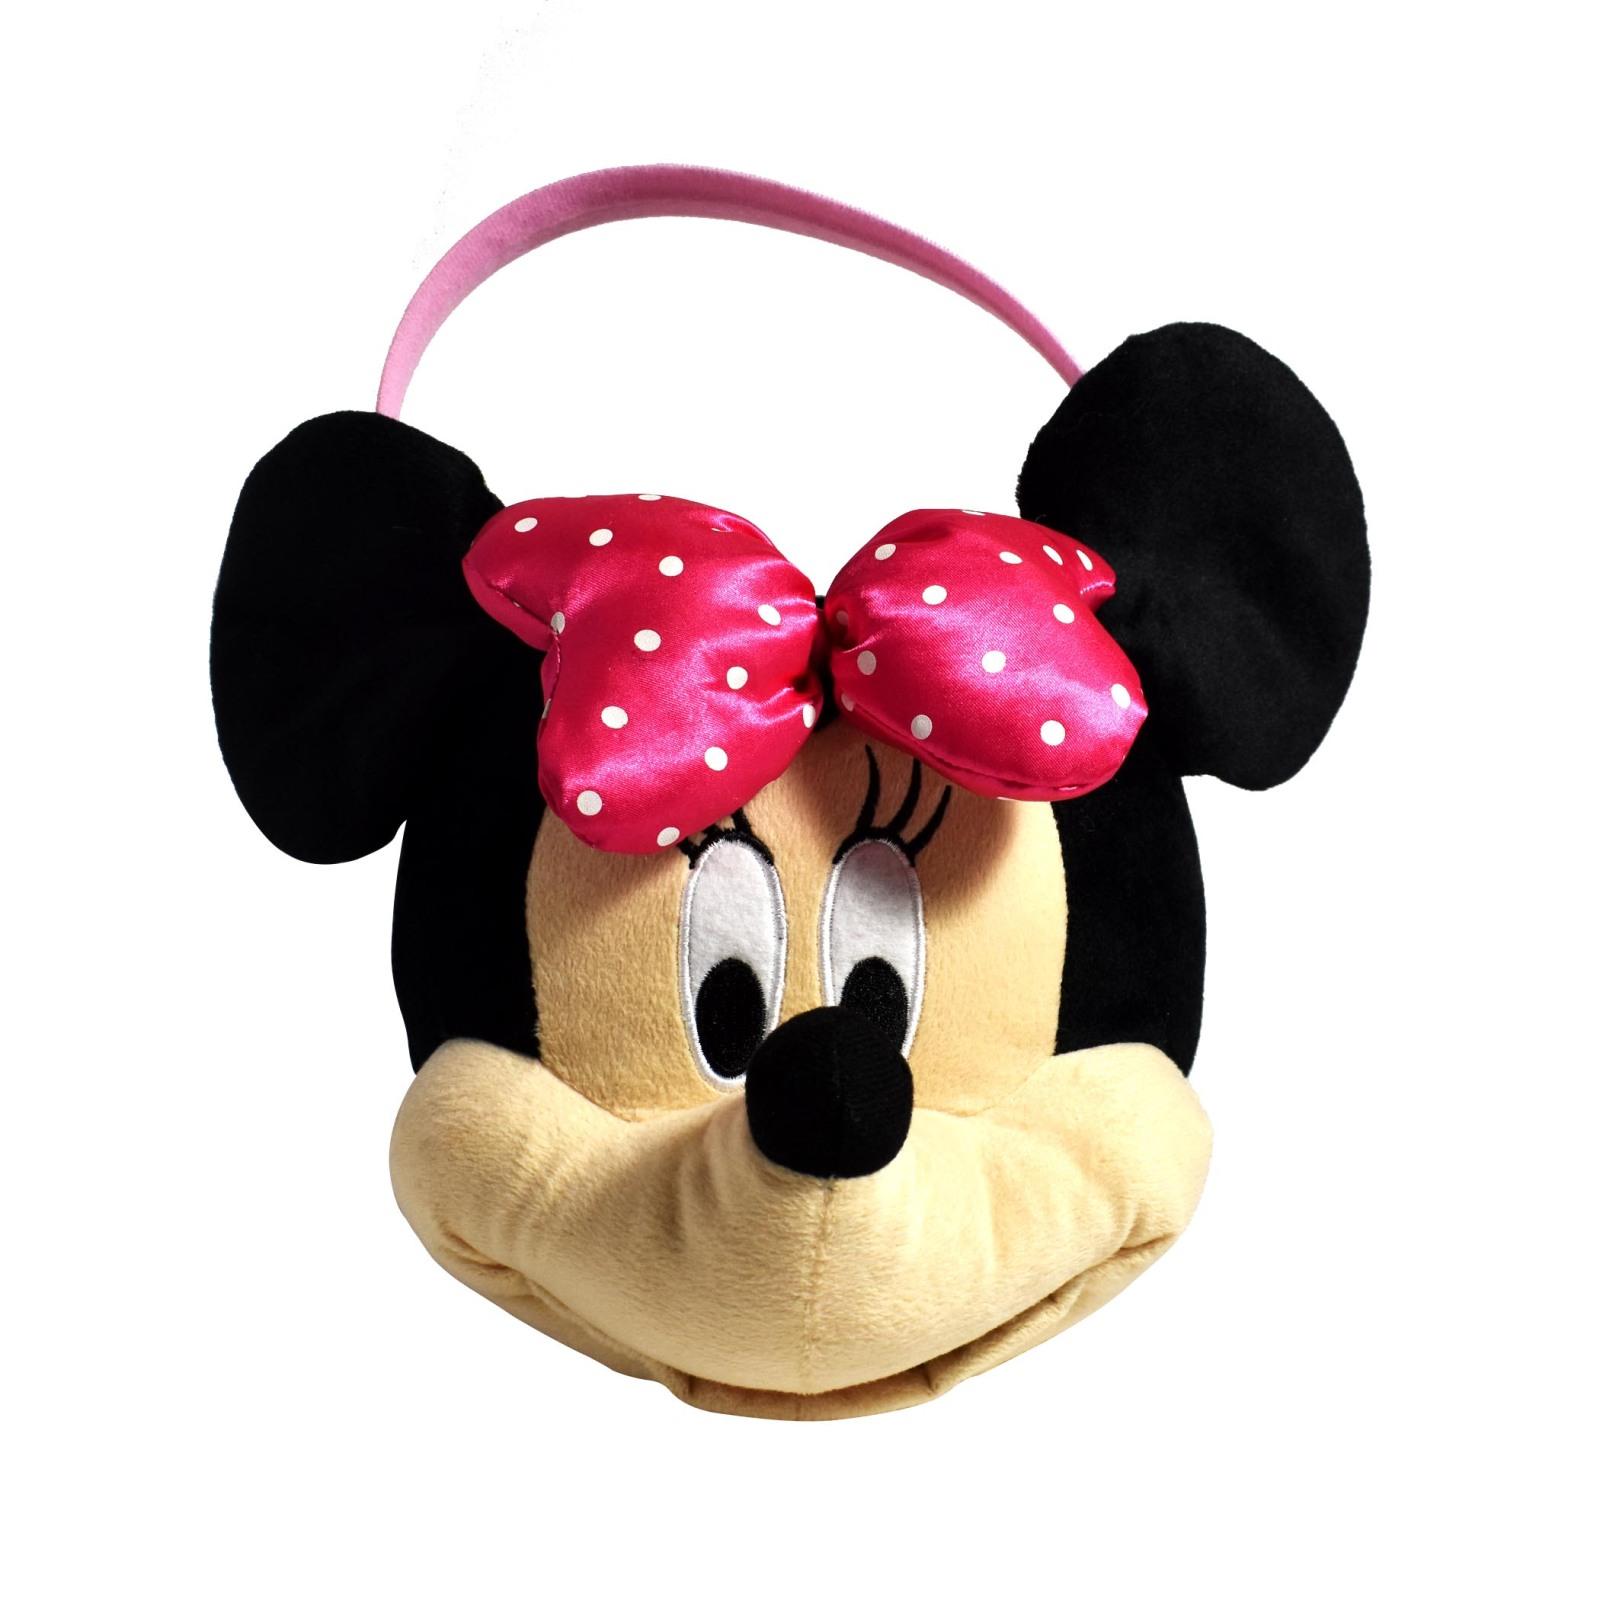 Disney Minnie Mouse Medium Plush Easter Basket